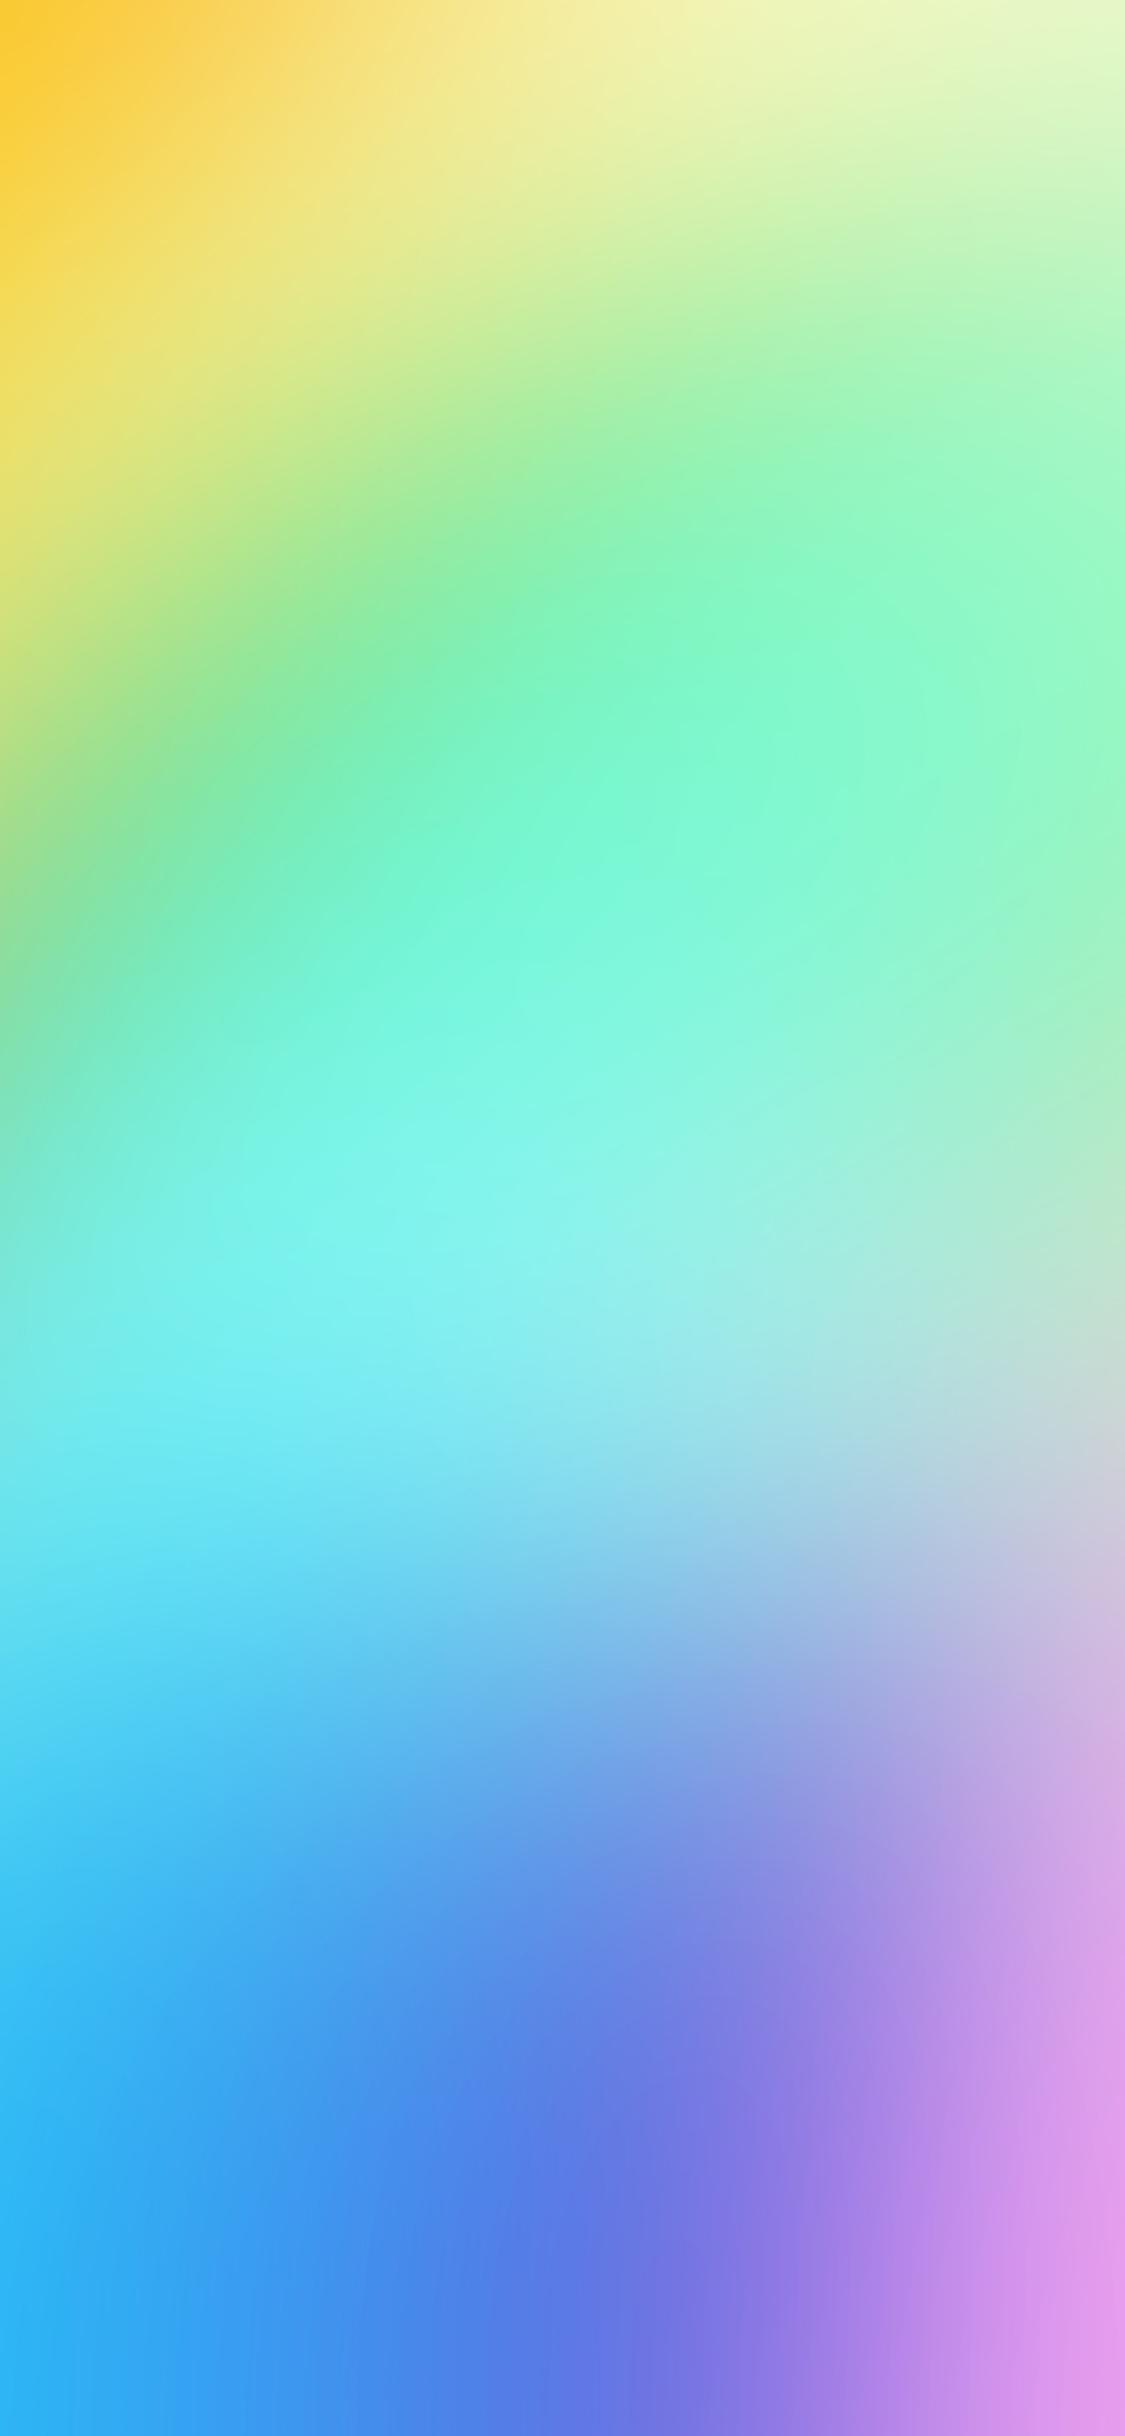 iPhoneXpapers.com-Apple-iPhone-wallpaper-sf73-rainbow-light-after-rain-gradation-blur